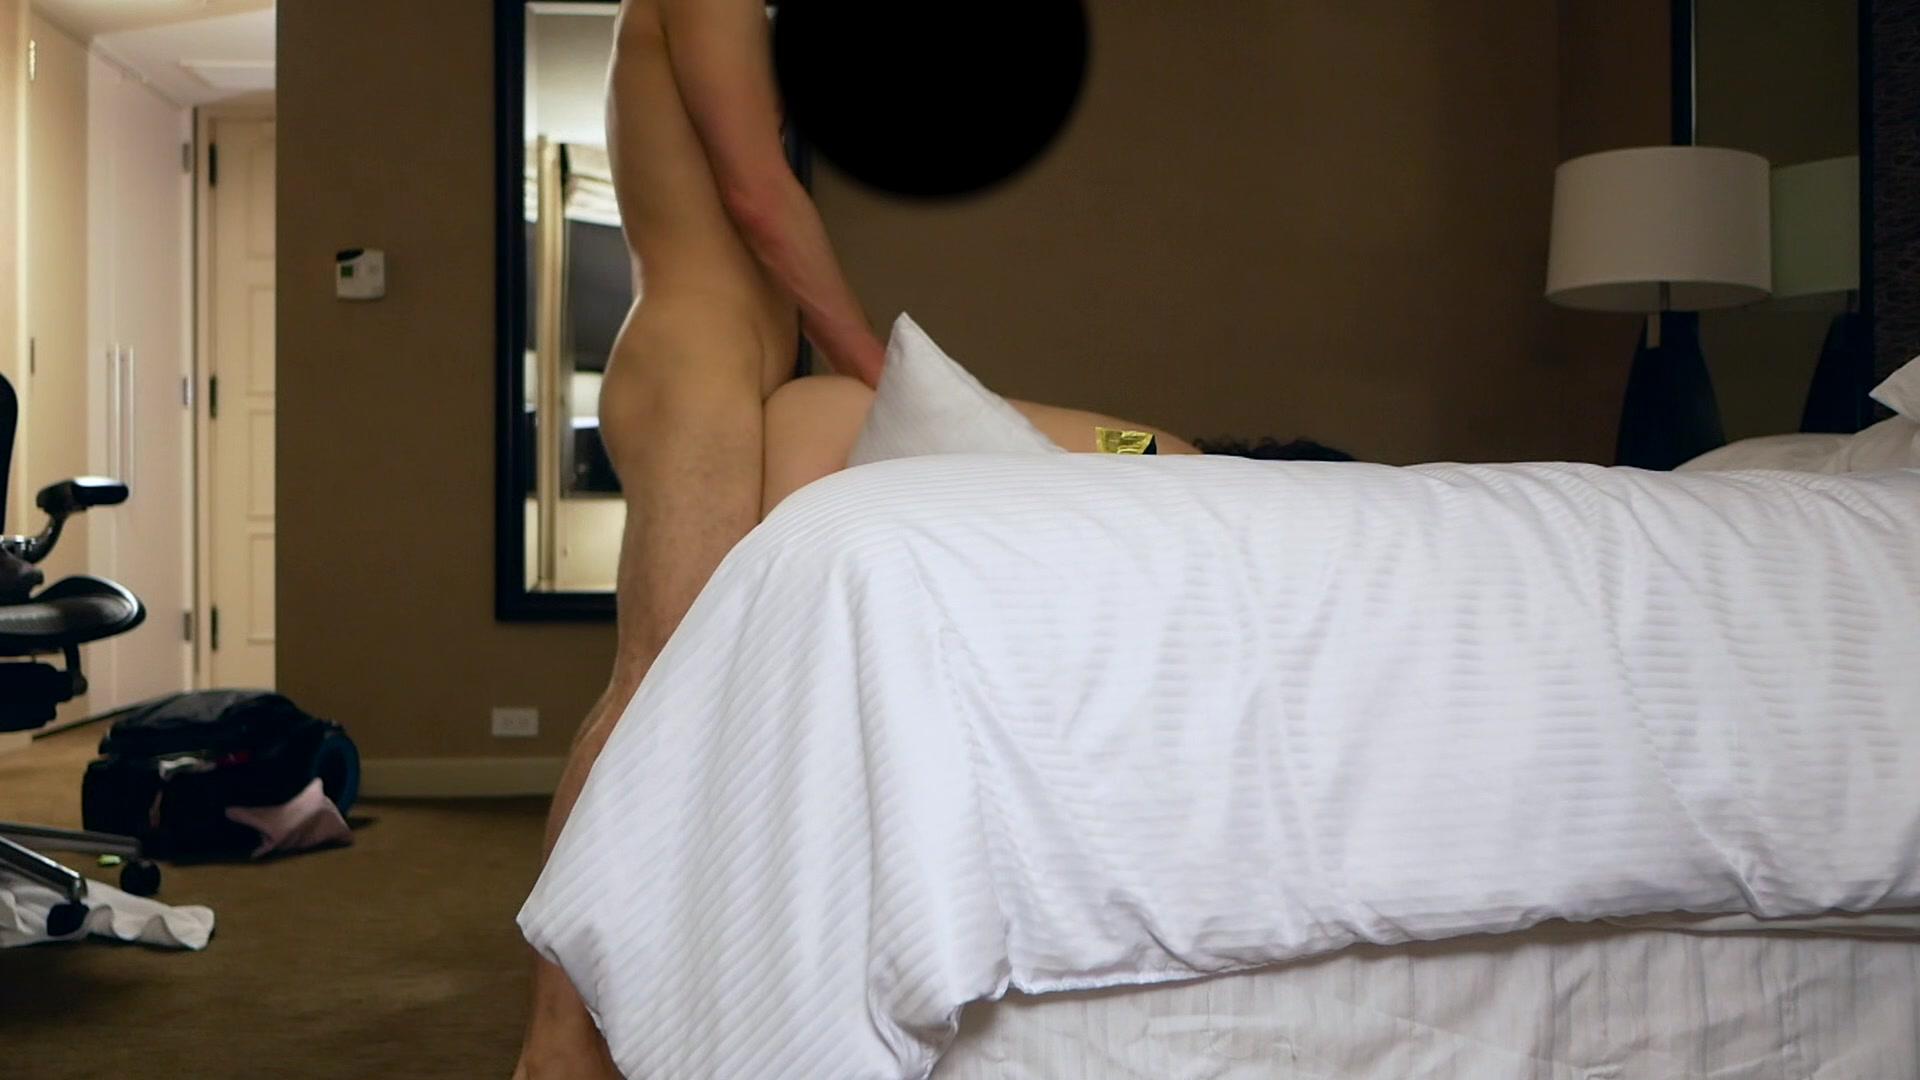 Teen Loud Moaning Orgasm